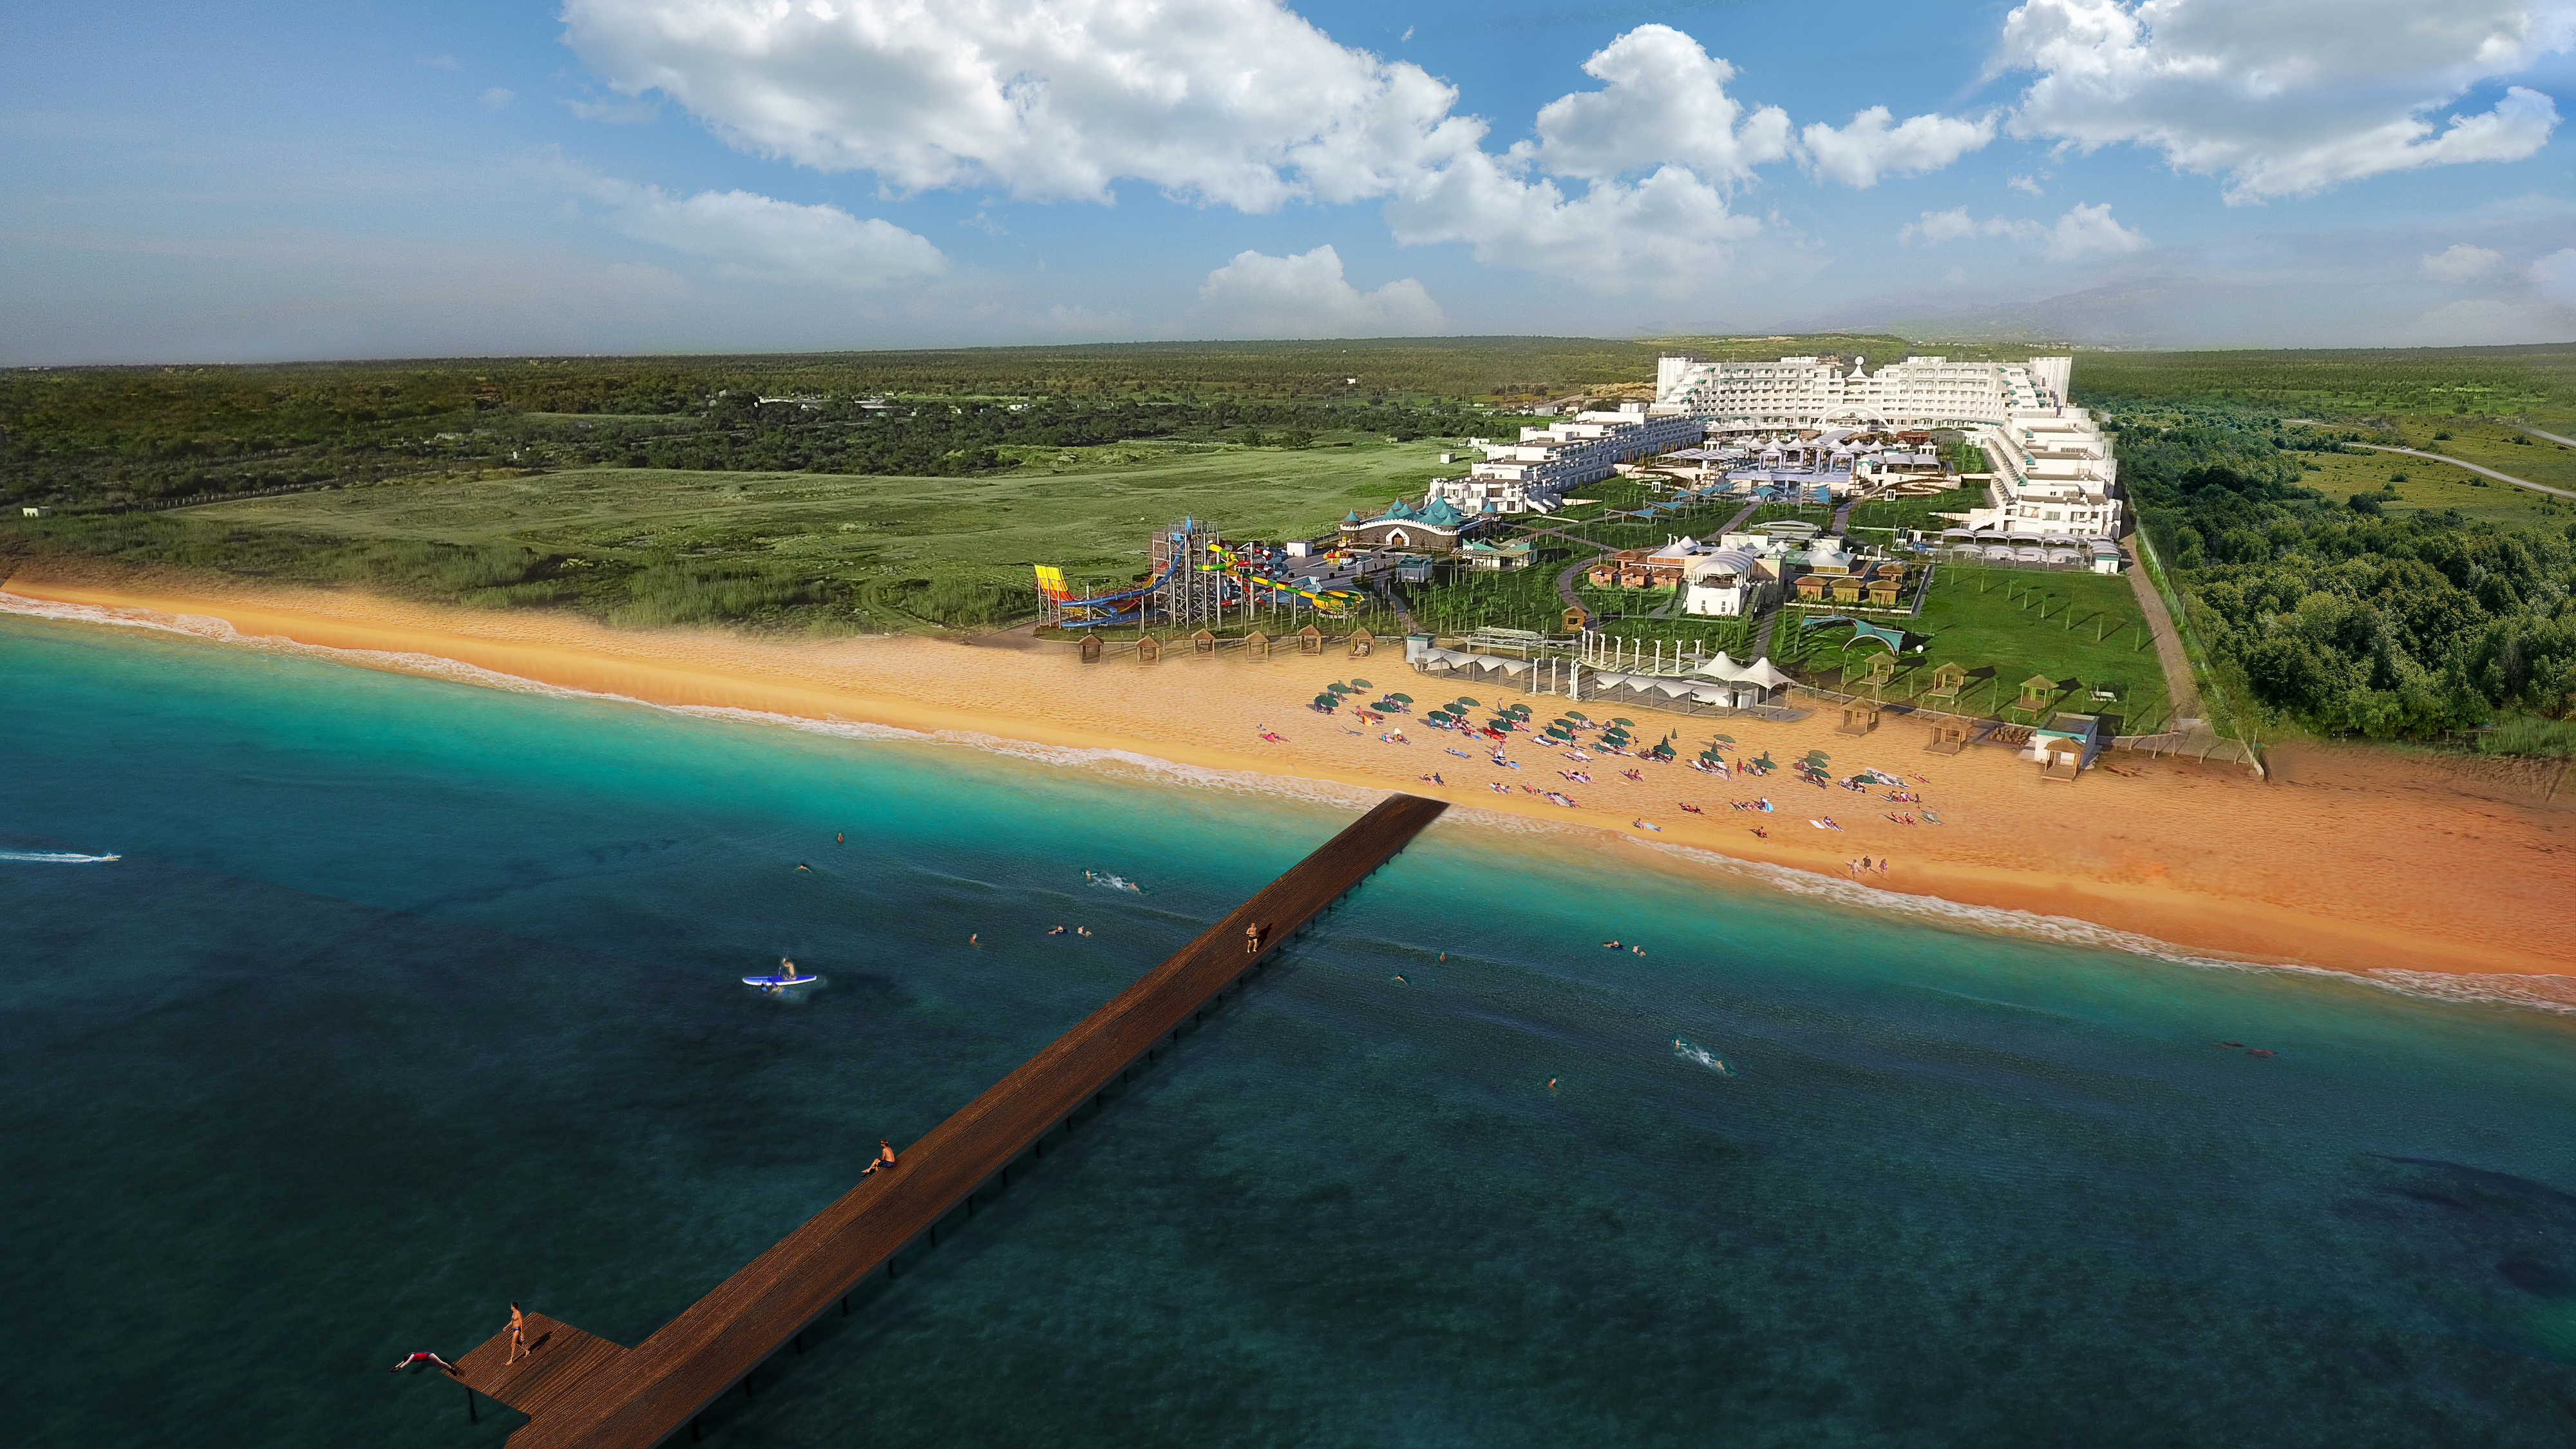 CYPR - LATO 2019: Limak Bafra Deluxe Hotel & Resort*****, 8 dni (10-17.05.2019 r.), ultra all inclusive: 3598,00 PLN/os. dorosła